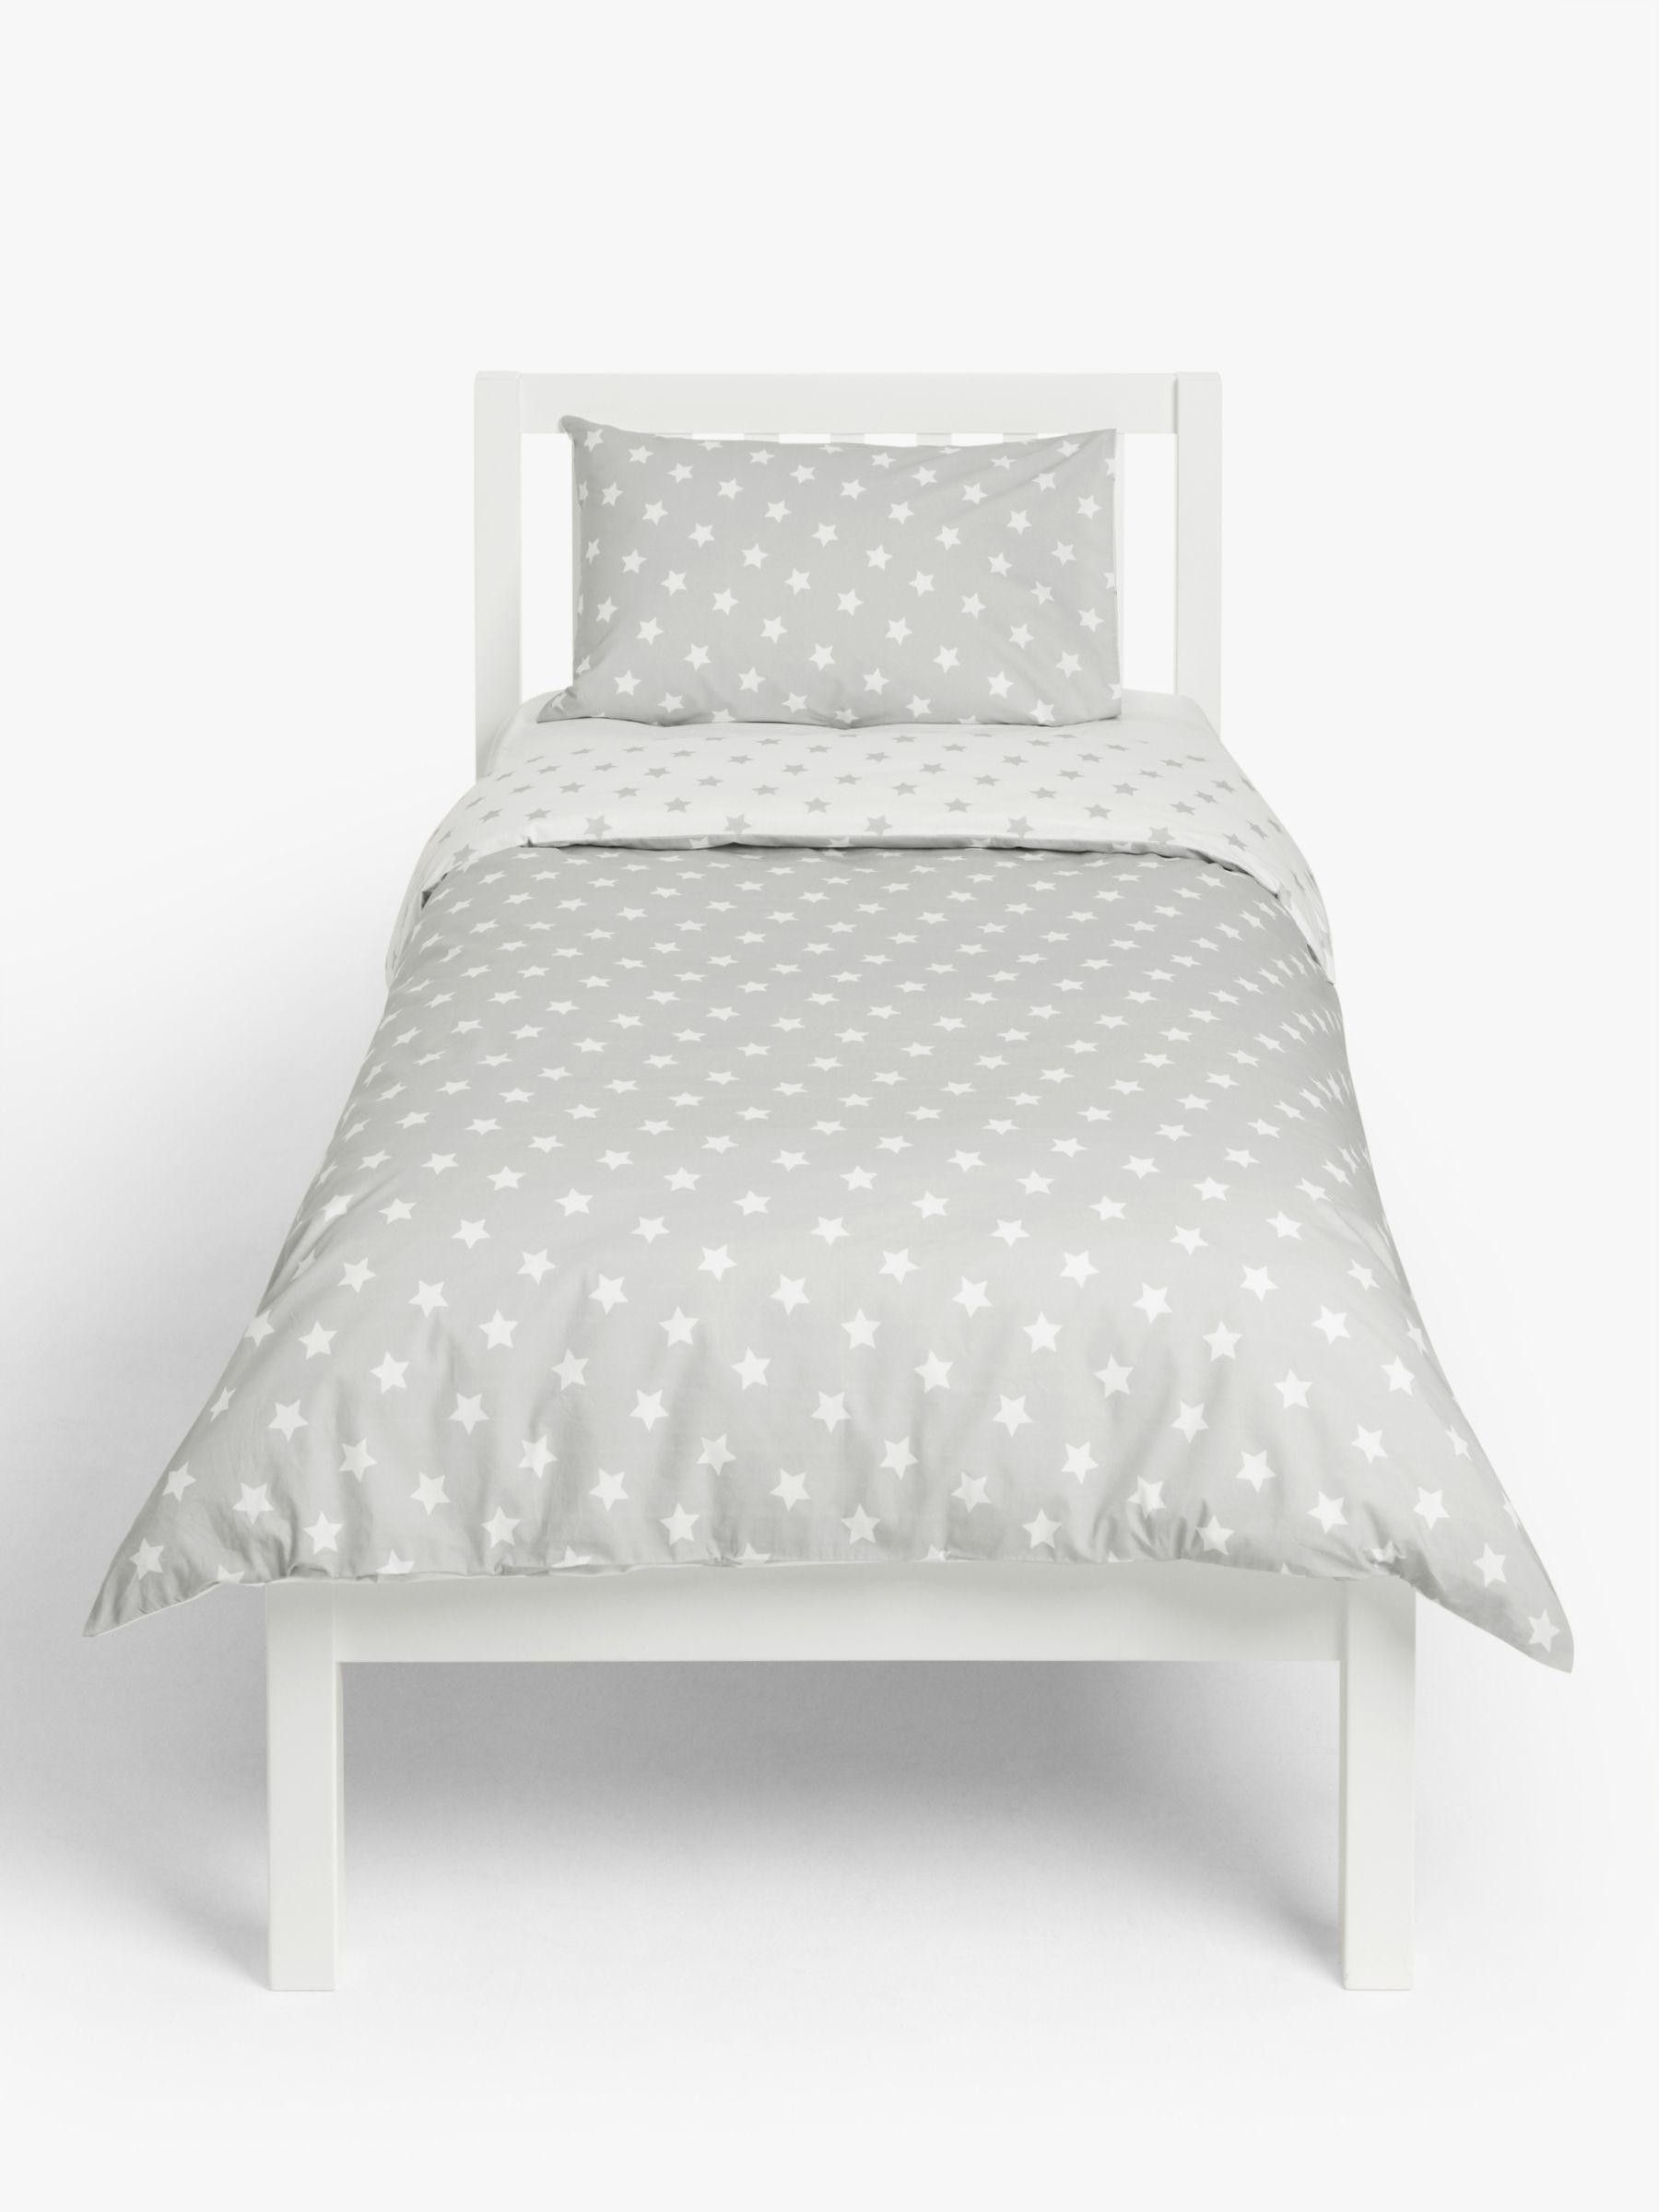 little home at John Lewis little home at John Lewis Star Reversible Duvet Cover and Pillowcase Set, Single, Grey